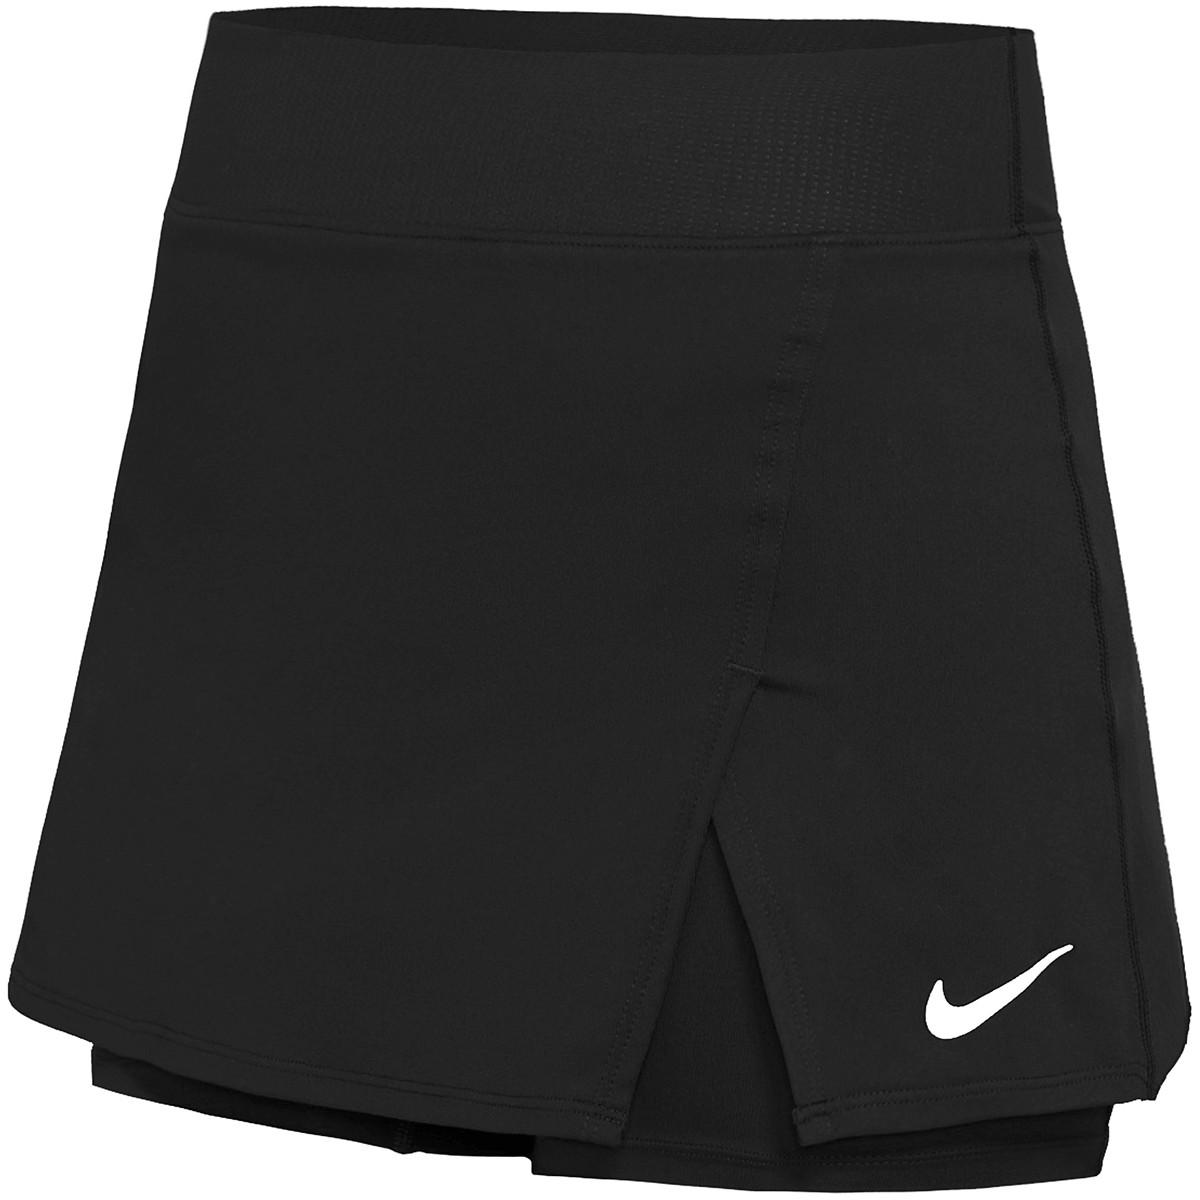 Saia SHORT Nike Court Victory SKIRT Preta